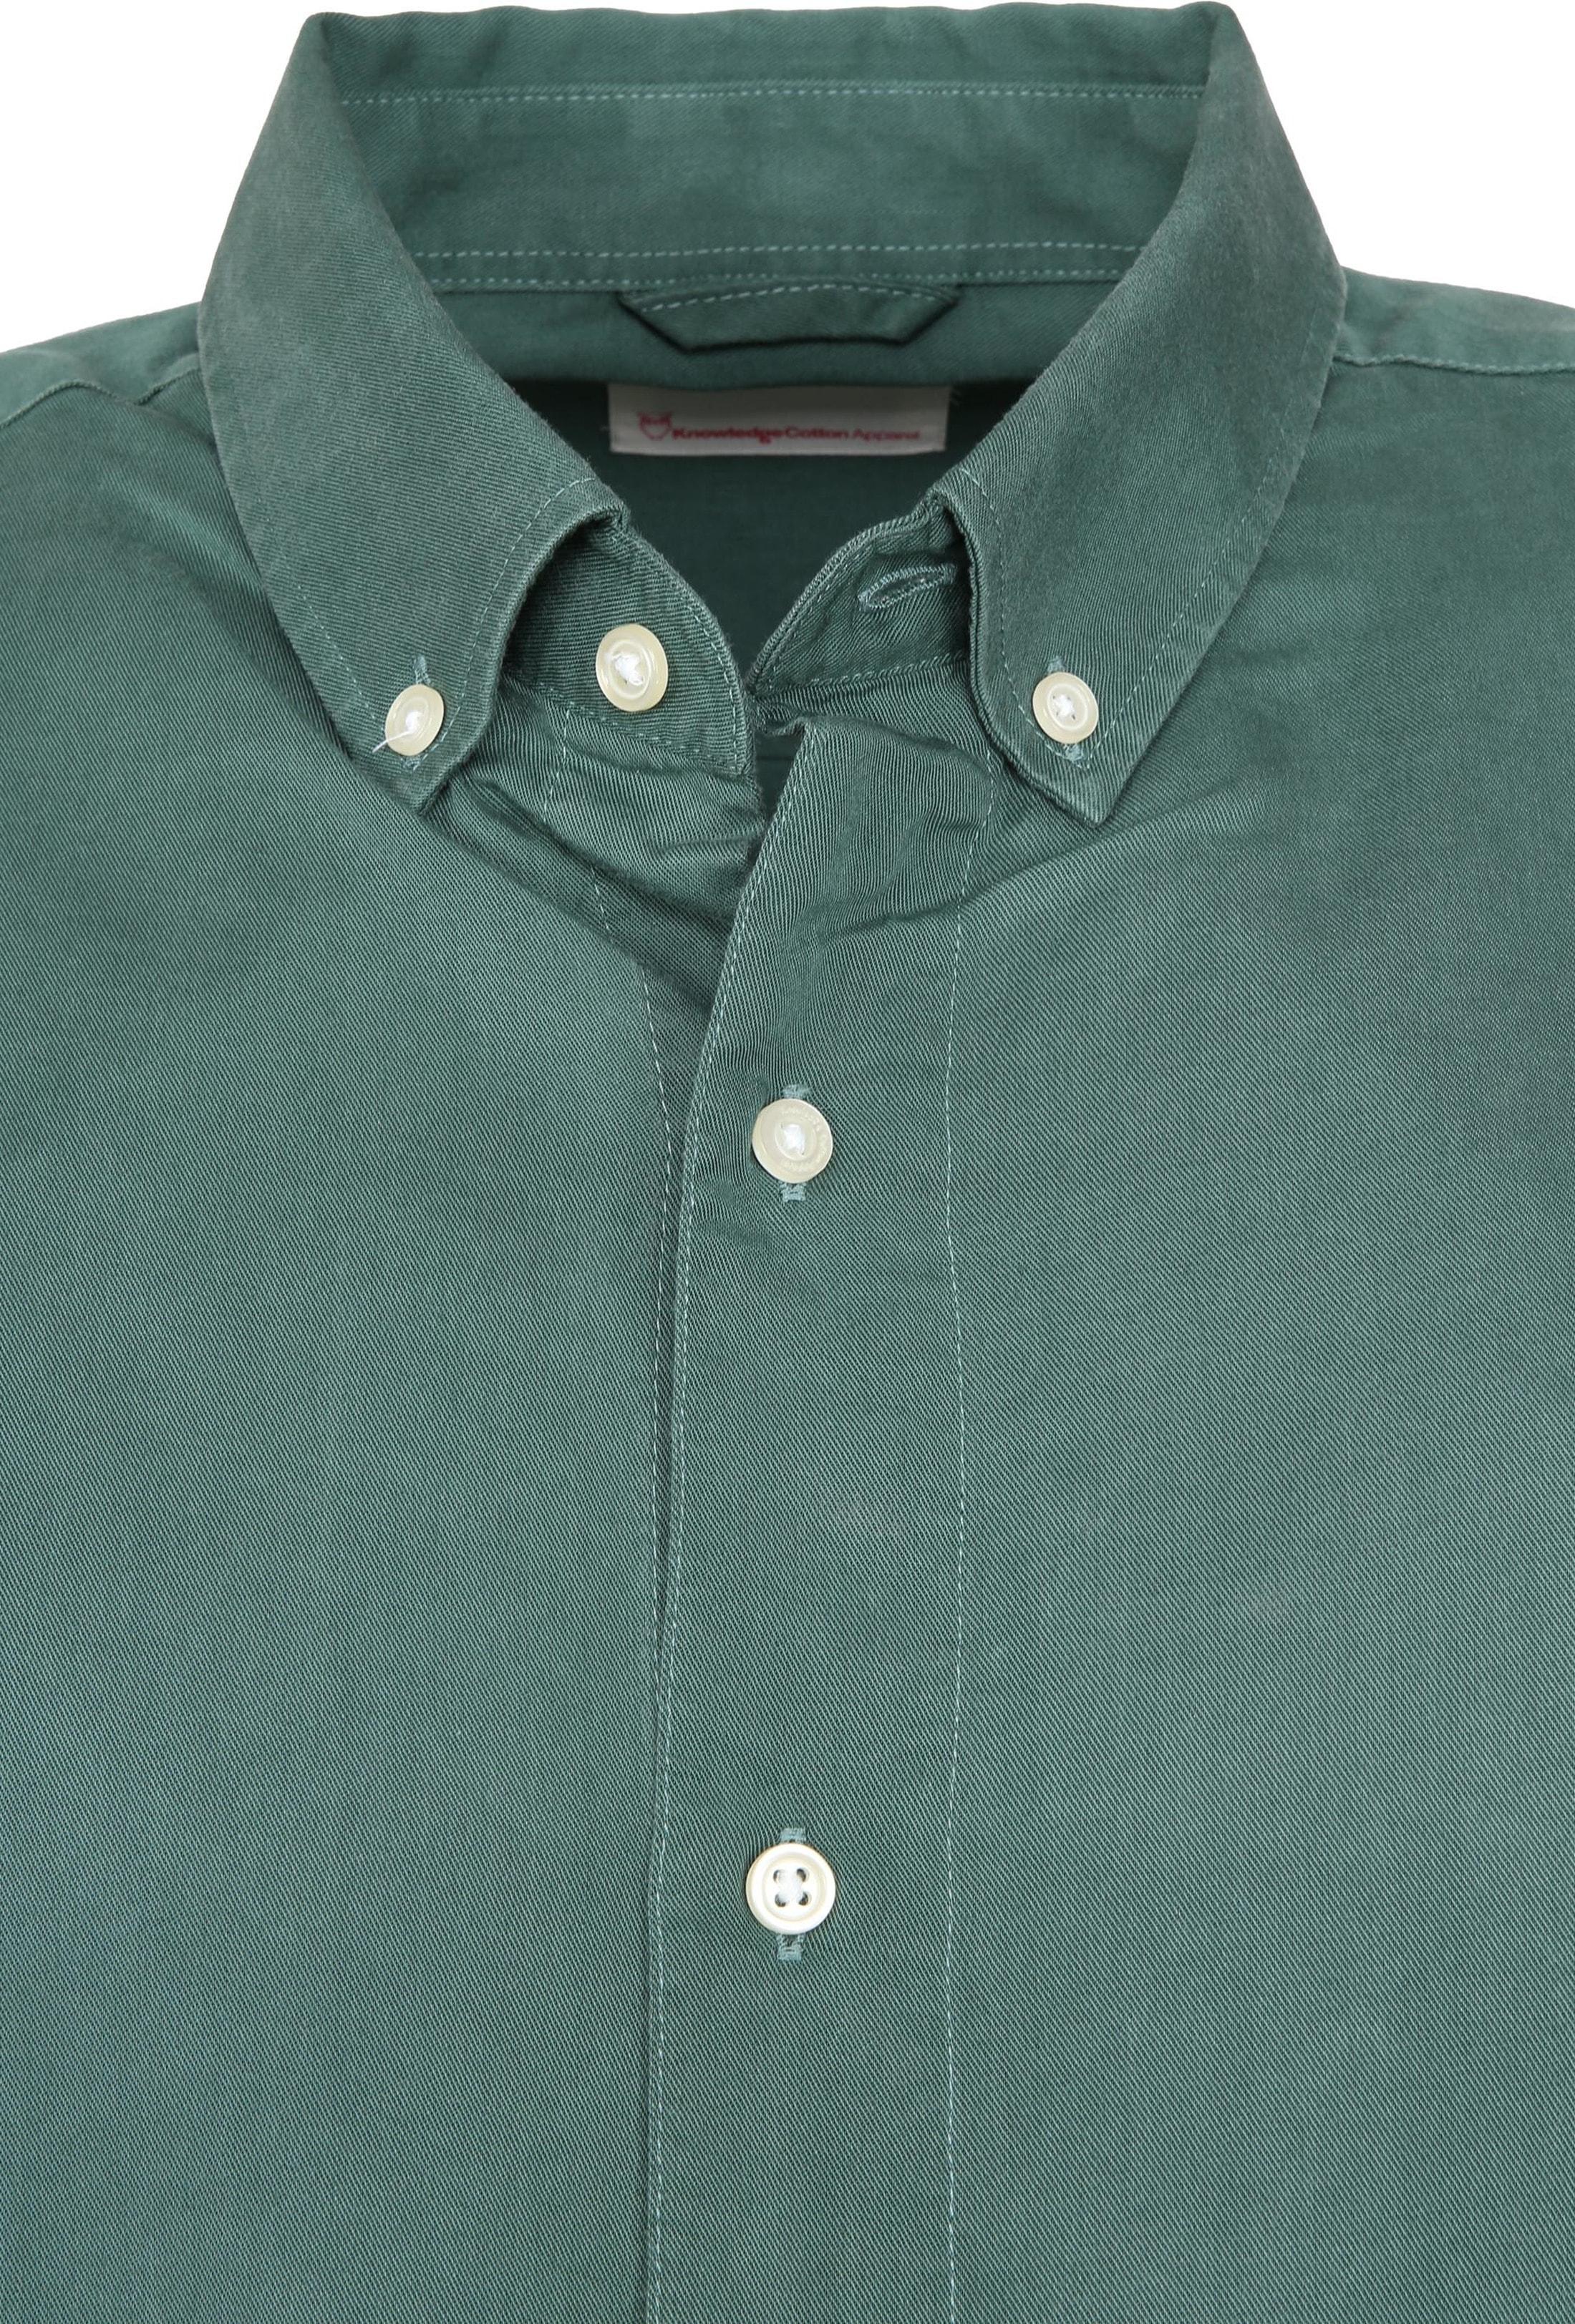 Knowledge Cotton Apparel Overhemd Groen foto 2